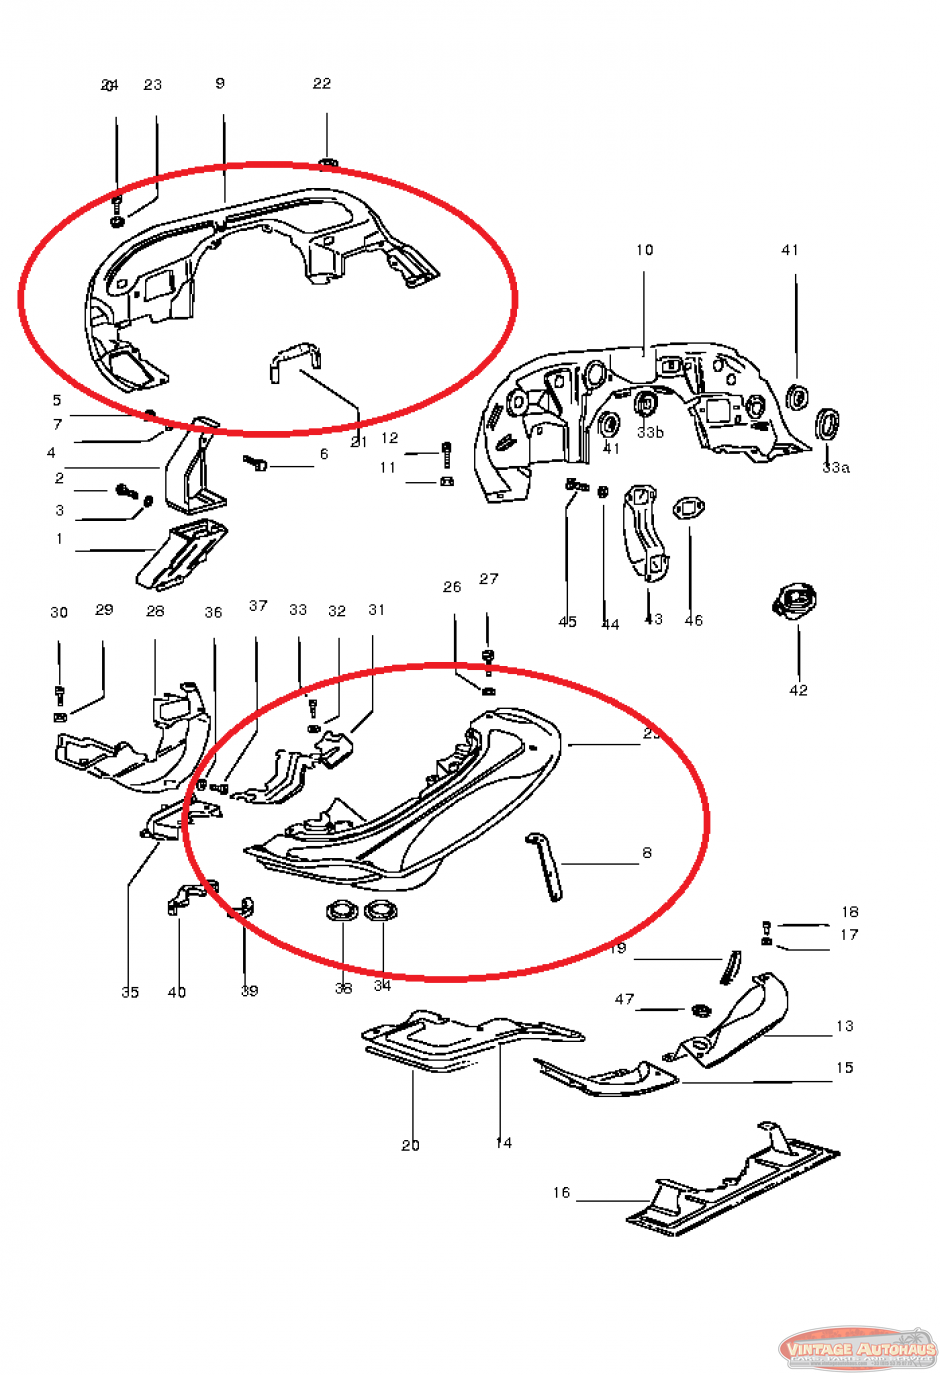 Honda Crv Fuse Box Diagram Wiring Automotive moreover 56ldf 98 Legacy Gt Wagon Check Engine Light On Diagnostics Knock Sensor additionally Gm 5 7 Engine Diagram in addition Honda Accord88 Radiator Diagram And Schematics furthermore 1988 Ford F350 Wiring Diagram. on 2000 subaru outback belt diagram